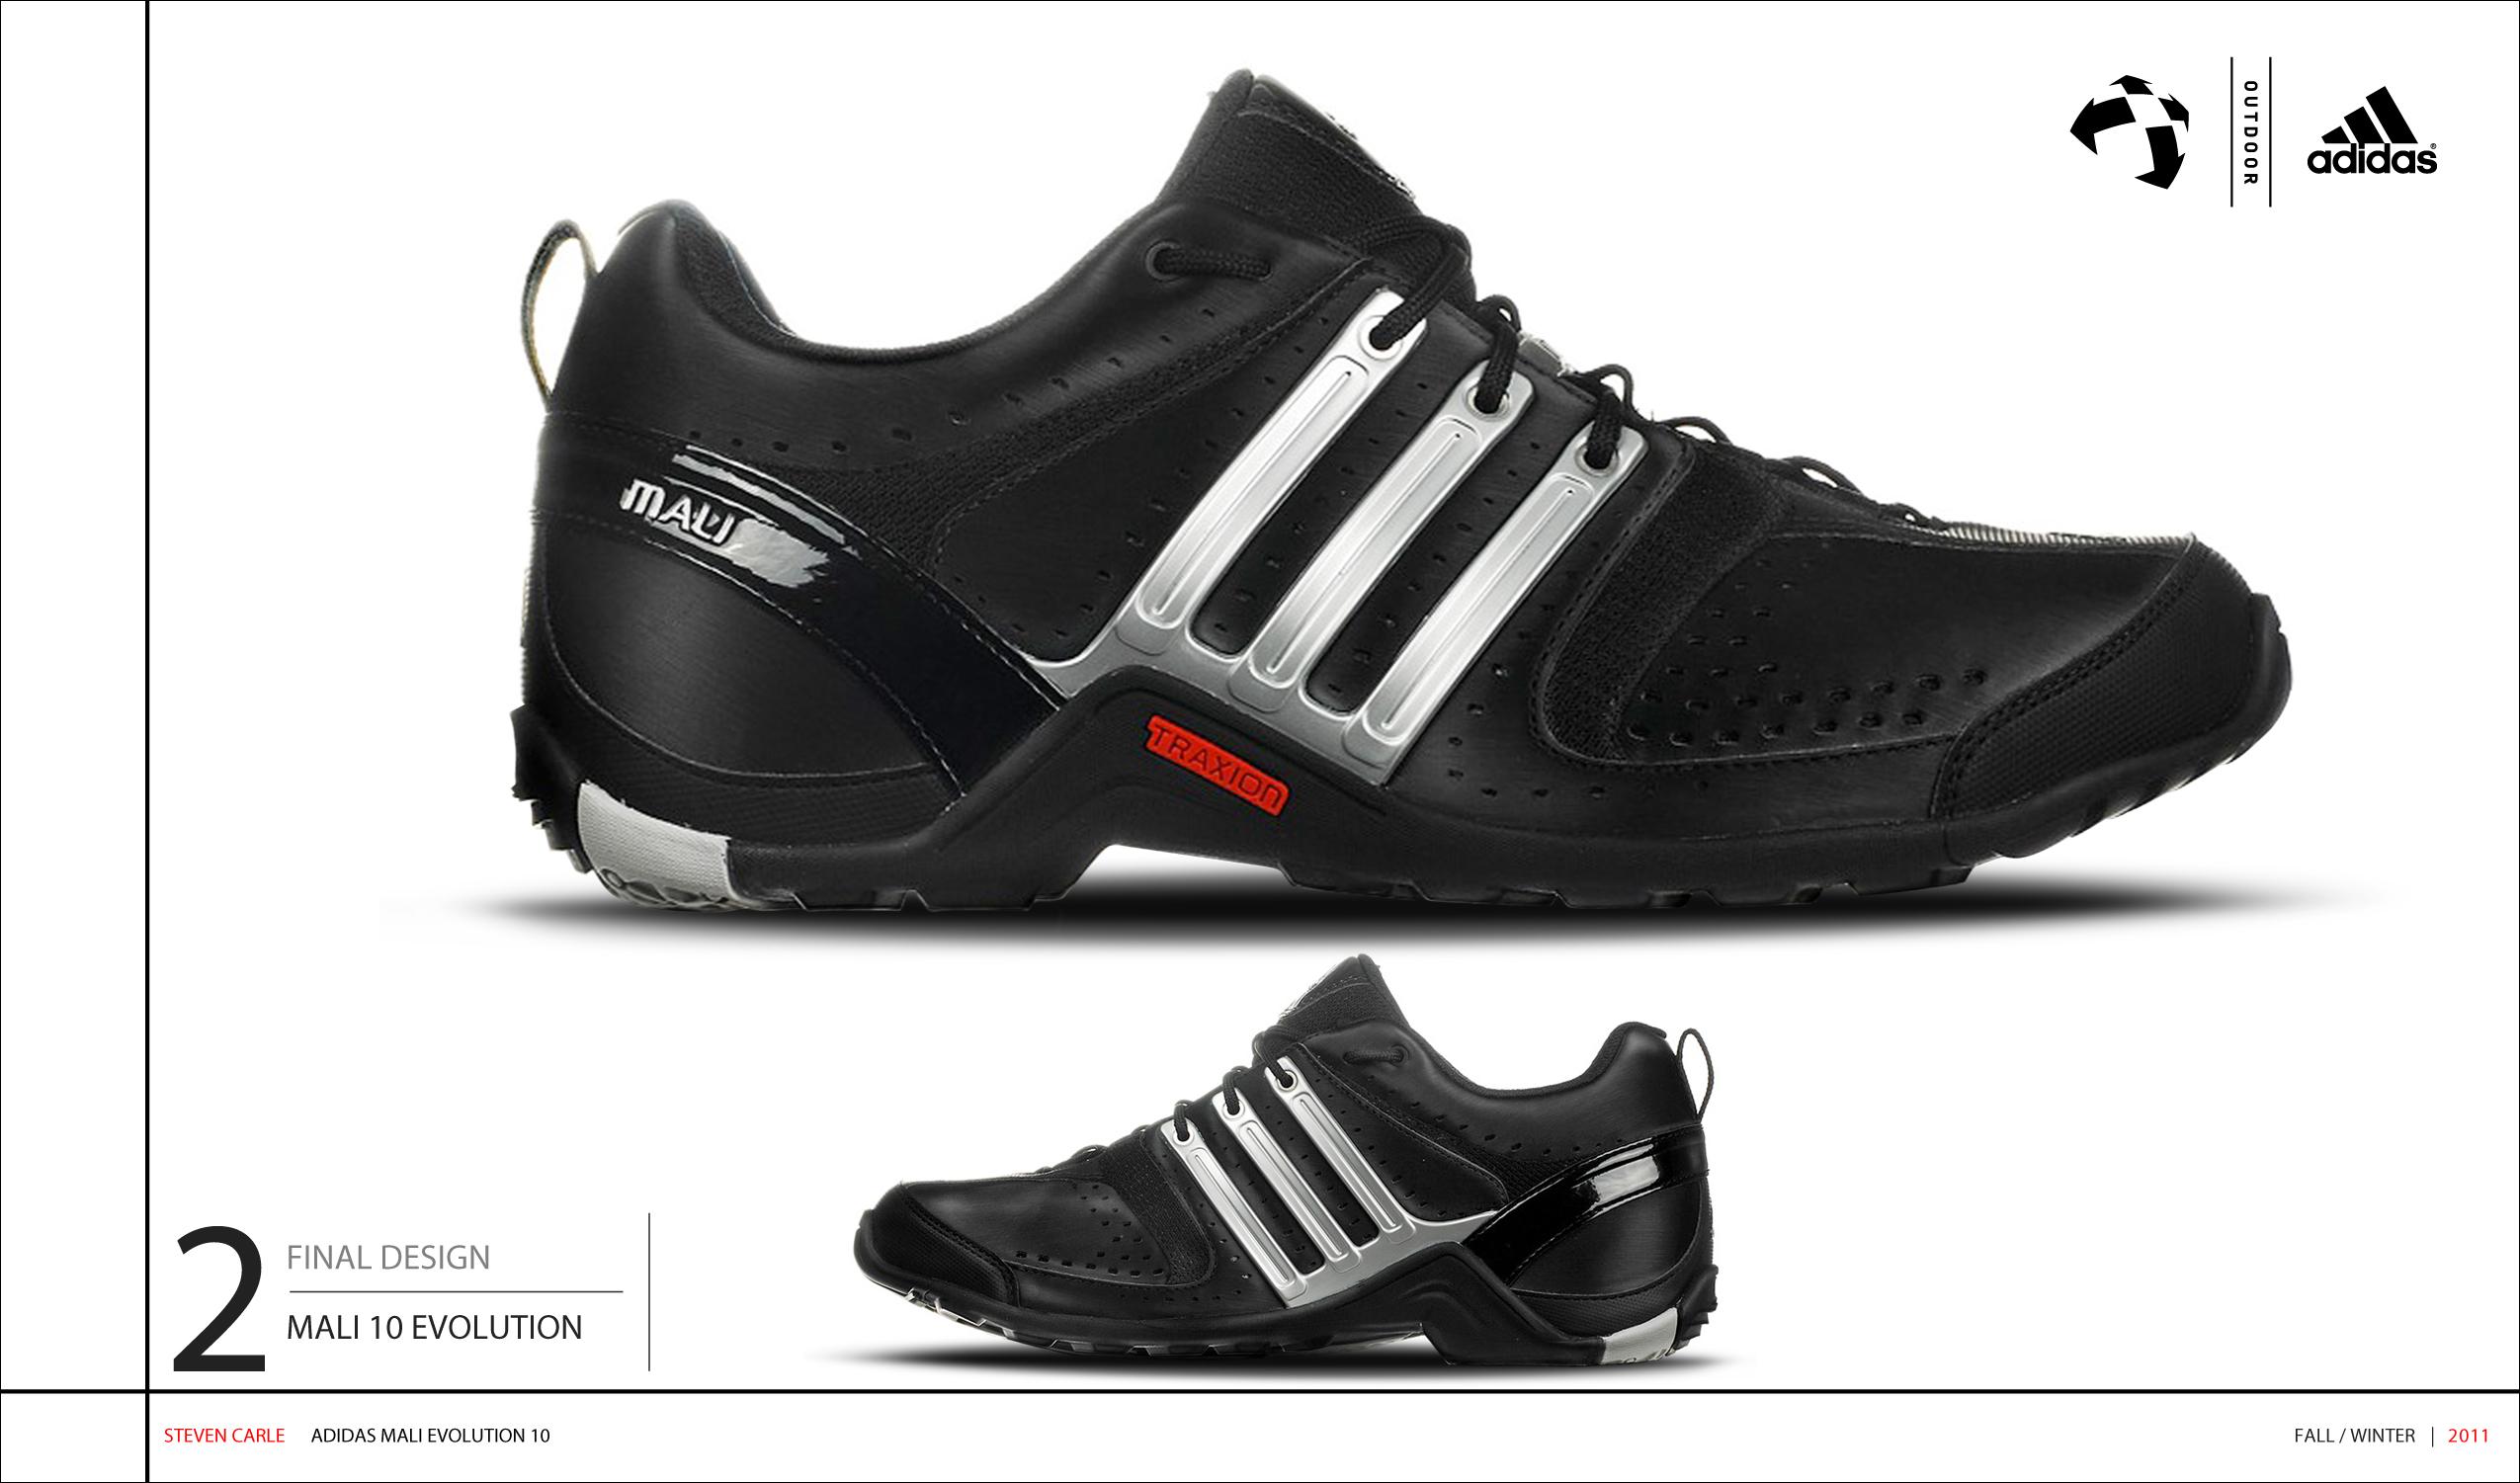 Adidas Mali Evolution 2010 on Behance d2b93703d75ec